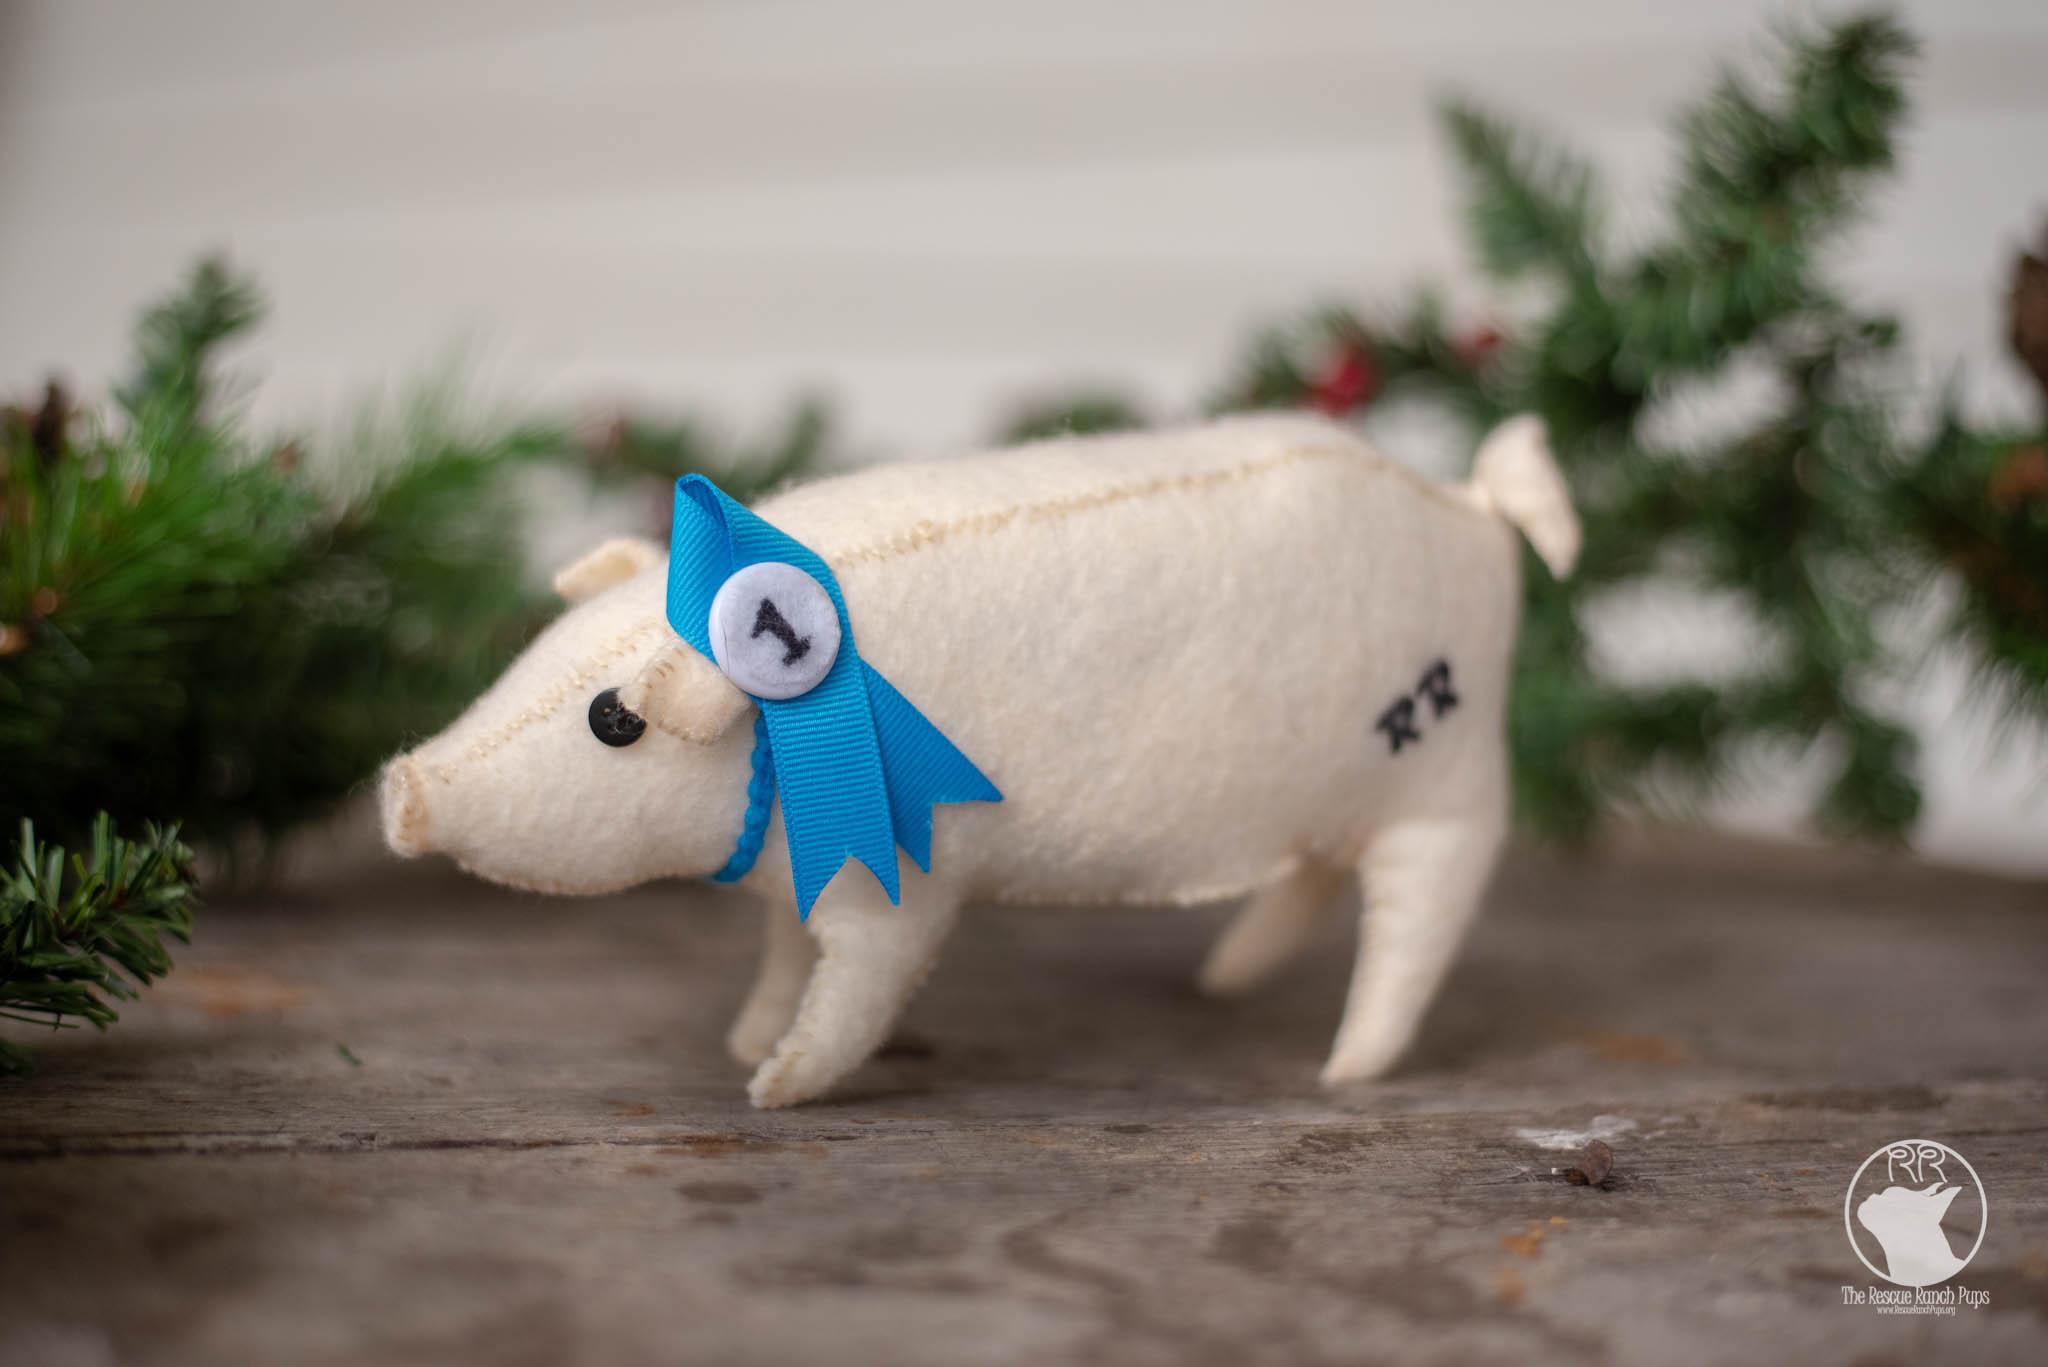 Adopt - A - RR Pig